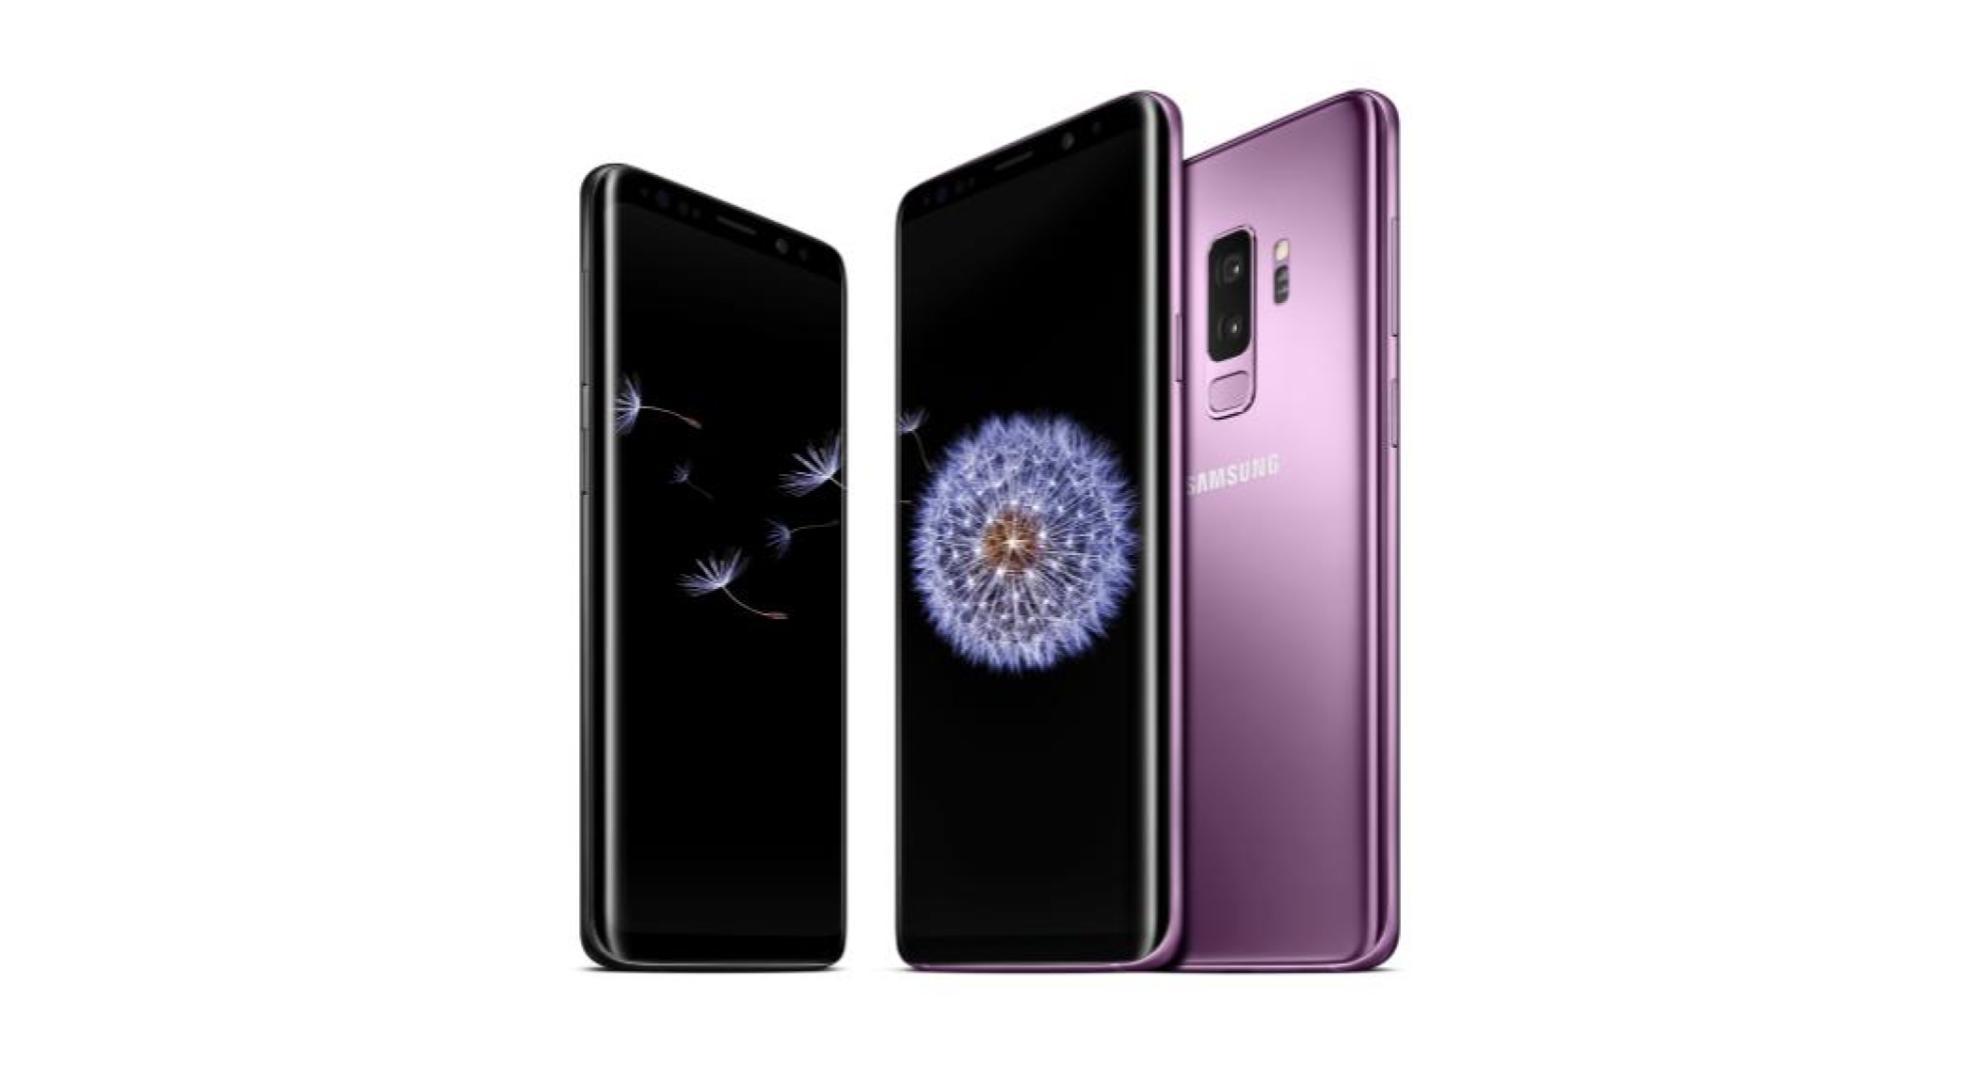 Les Samsung Galaxy S9 et S9 + reçoivent One UI 2.5